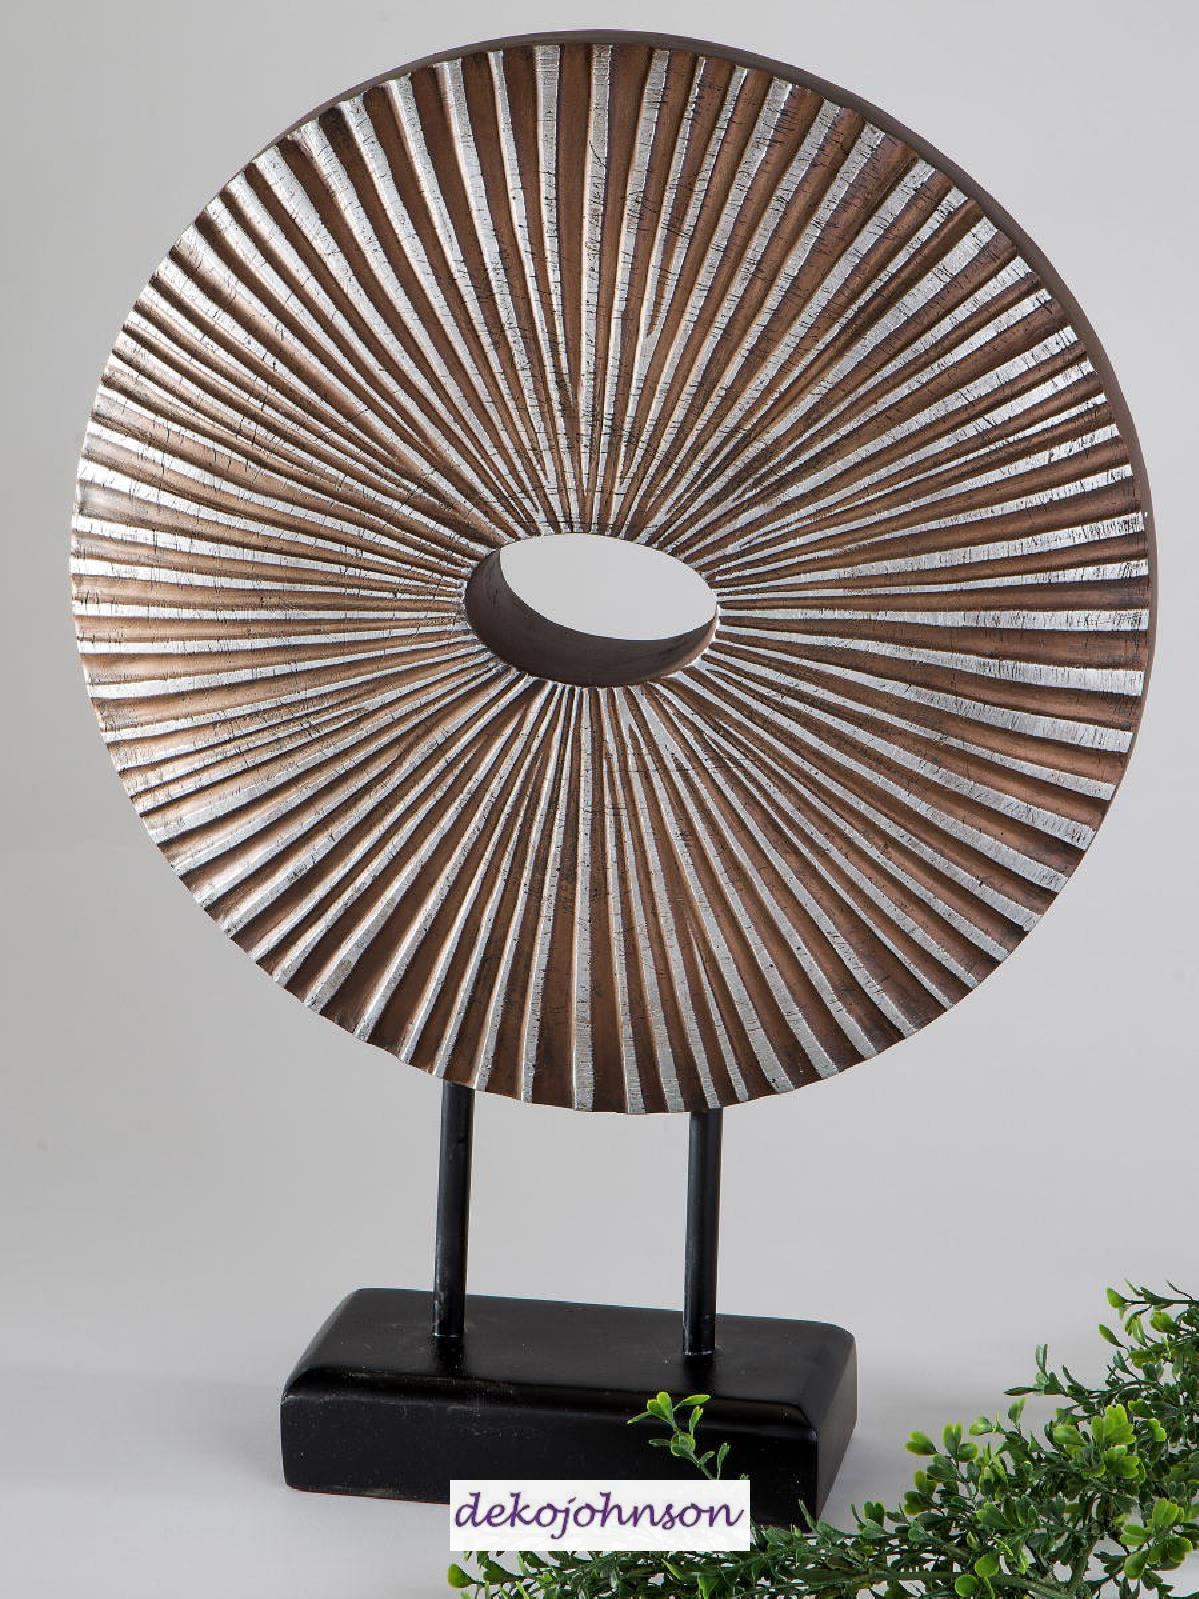 Deko-Objekt Ravello,54 cm Skulptur Kunstobjekt Dekofigur Geschenk modern  eBay